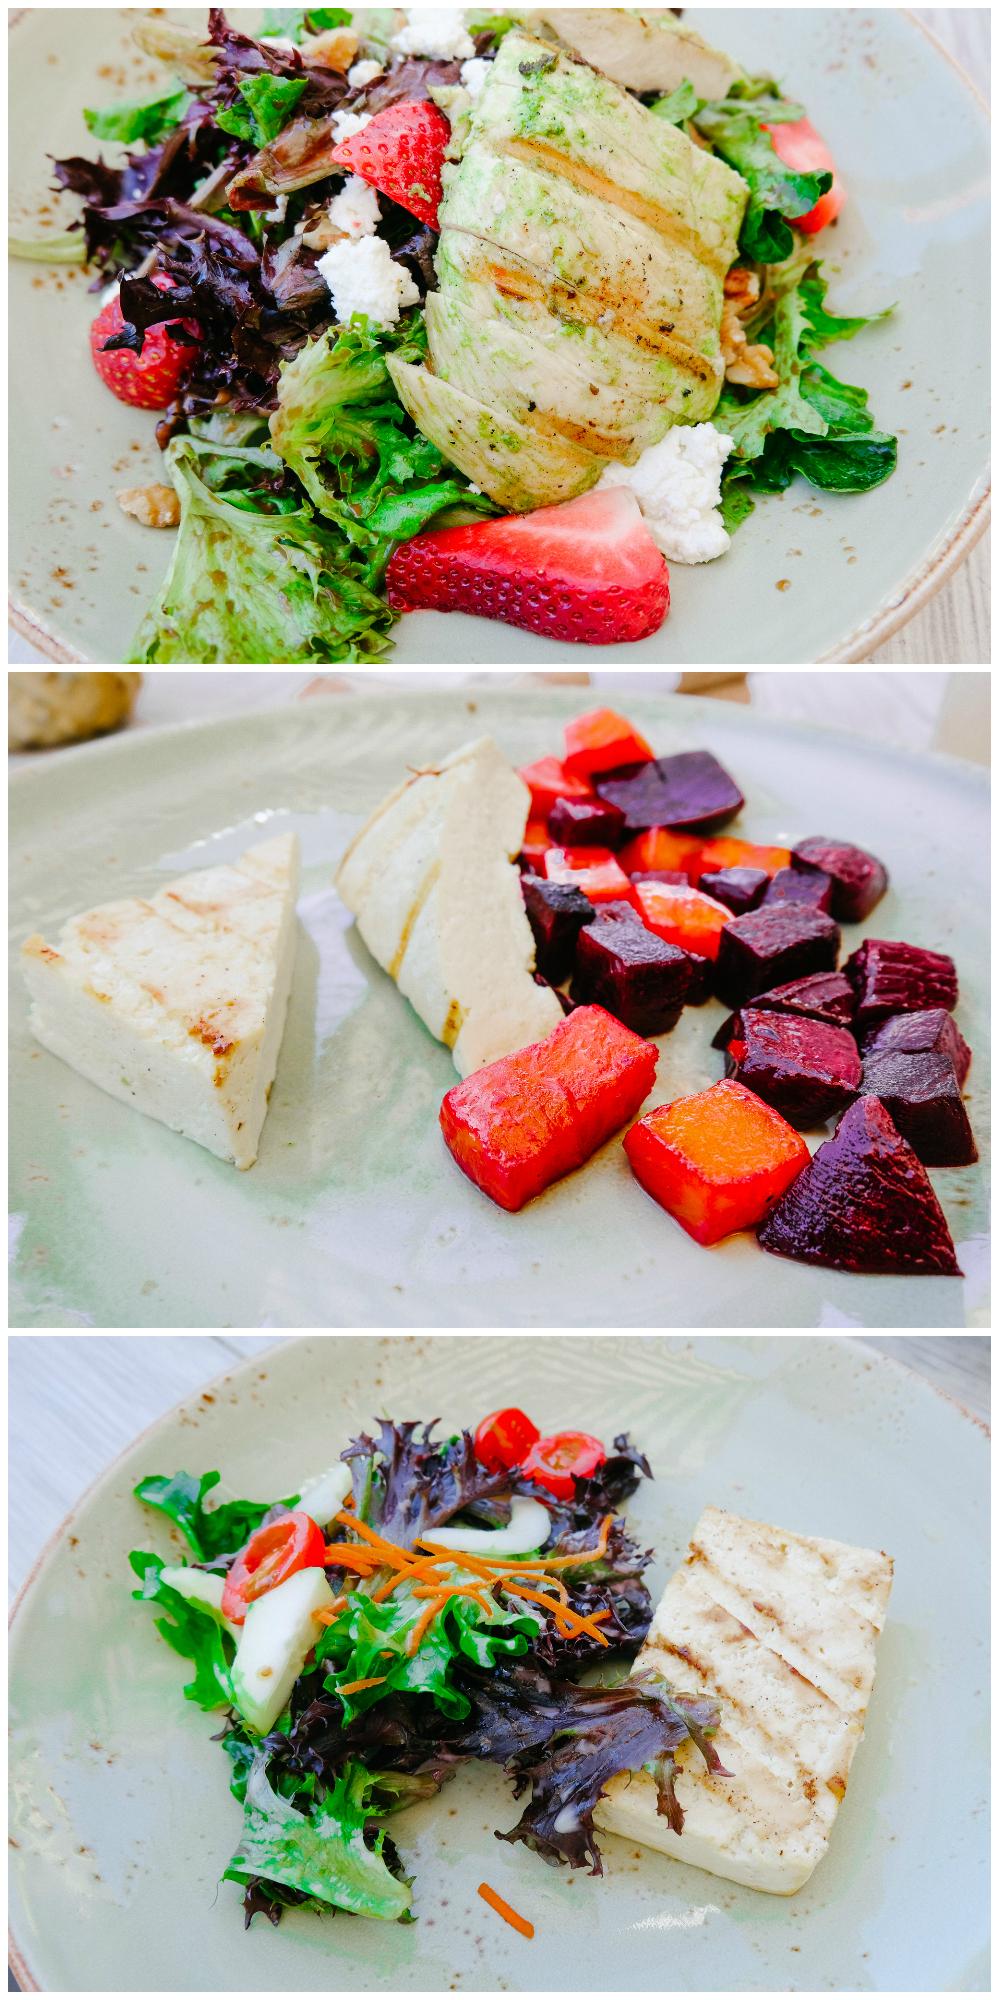 Vegan Food in Scottsdale AZ